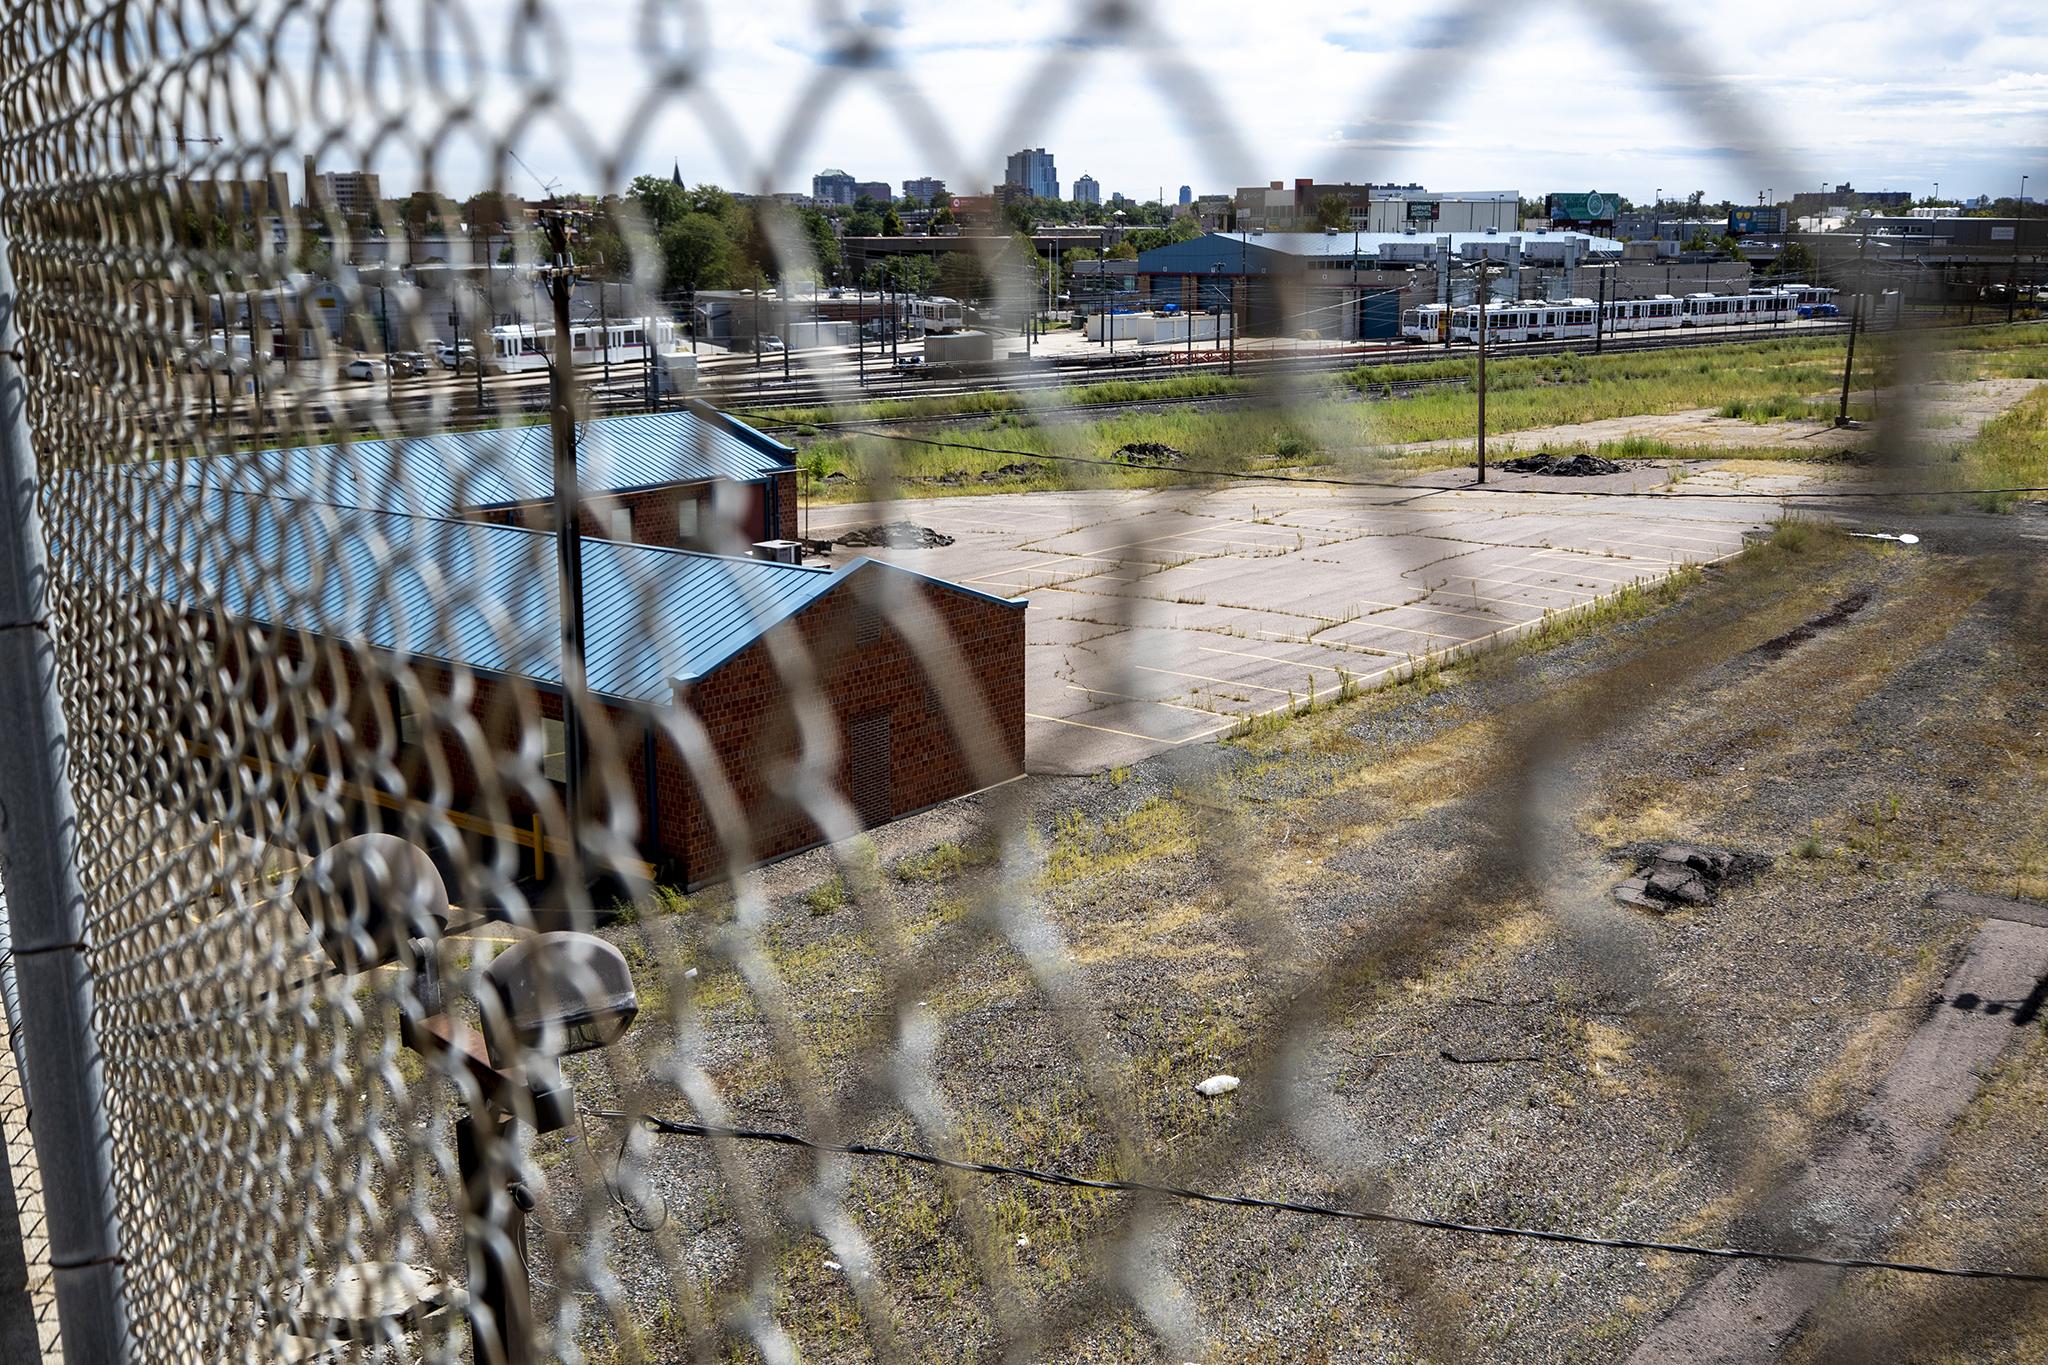 Burnham Repair Yard, Lincoln Park, Sept. 13, 2019. (Kevin J. Beaty/Denverite)